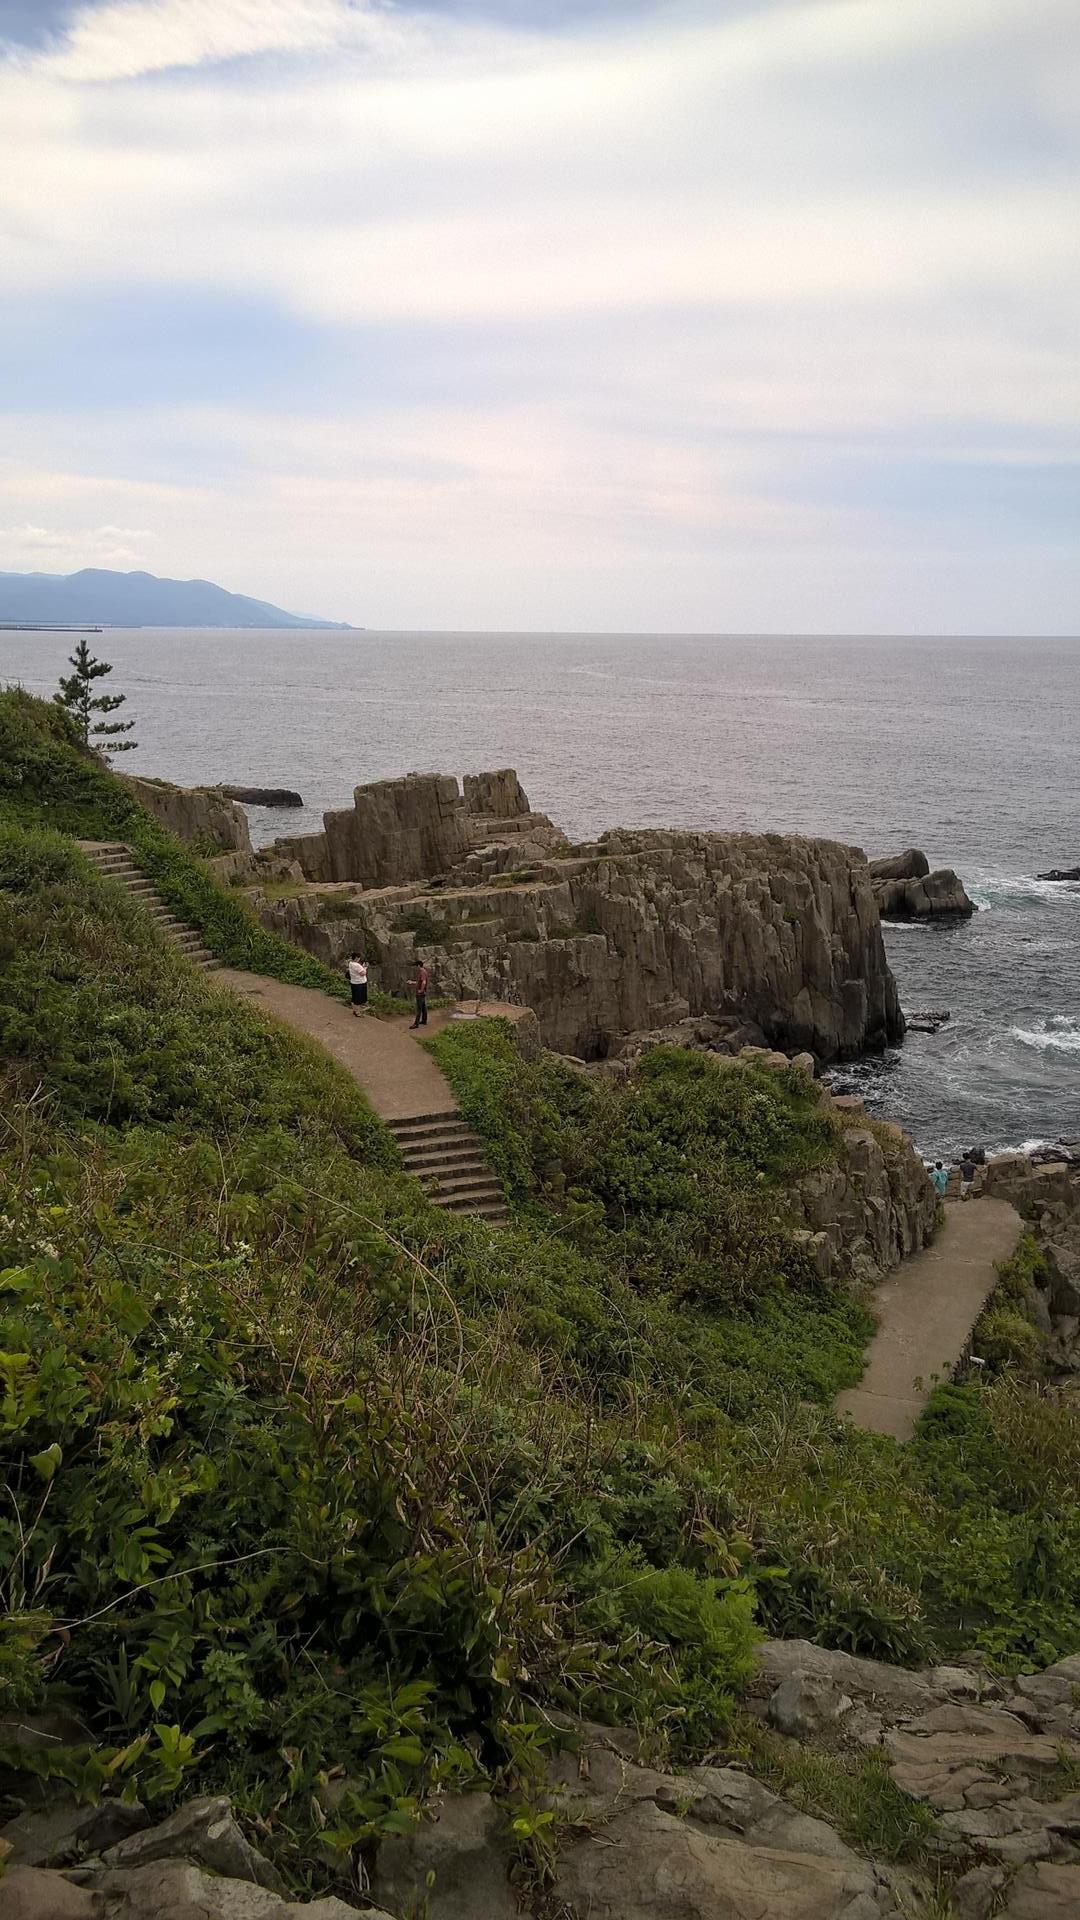 Suizid-Ort oder Touristen Attraktion: Mit Wegen ist hier manches gut erschlossen